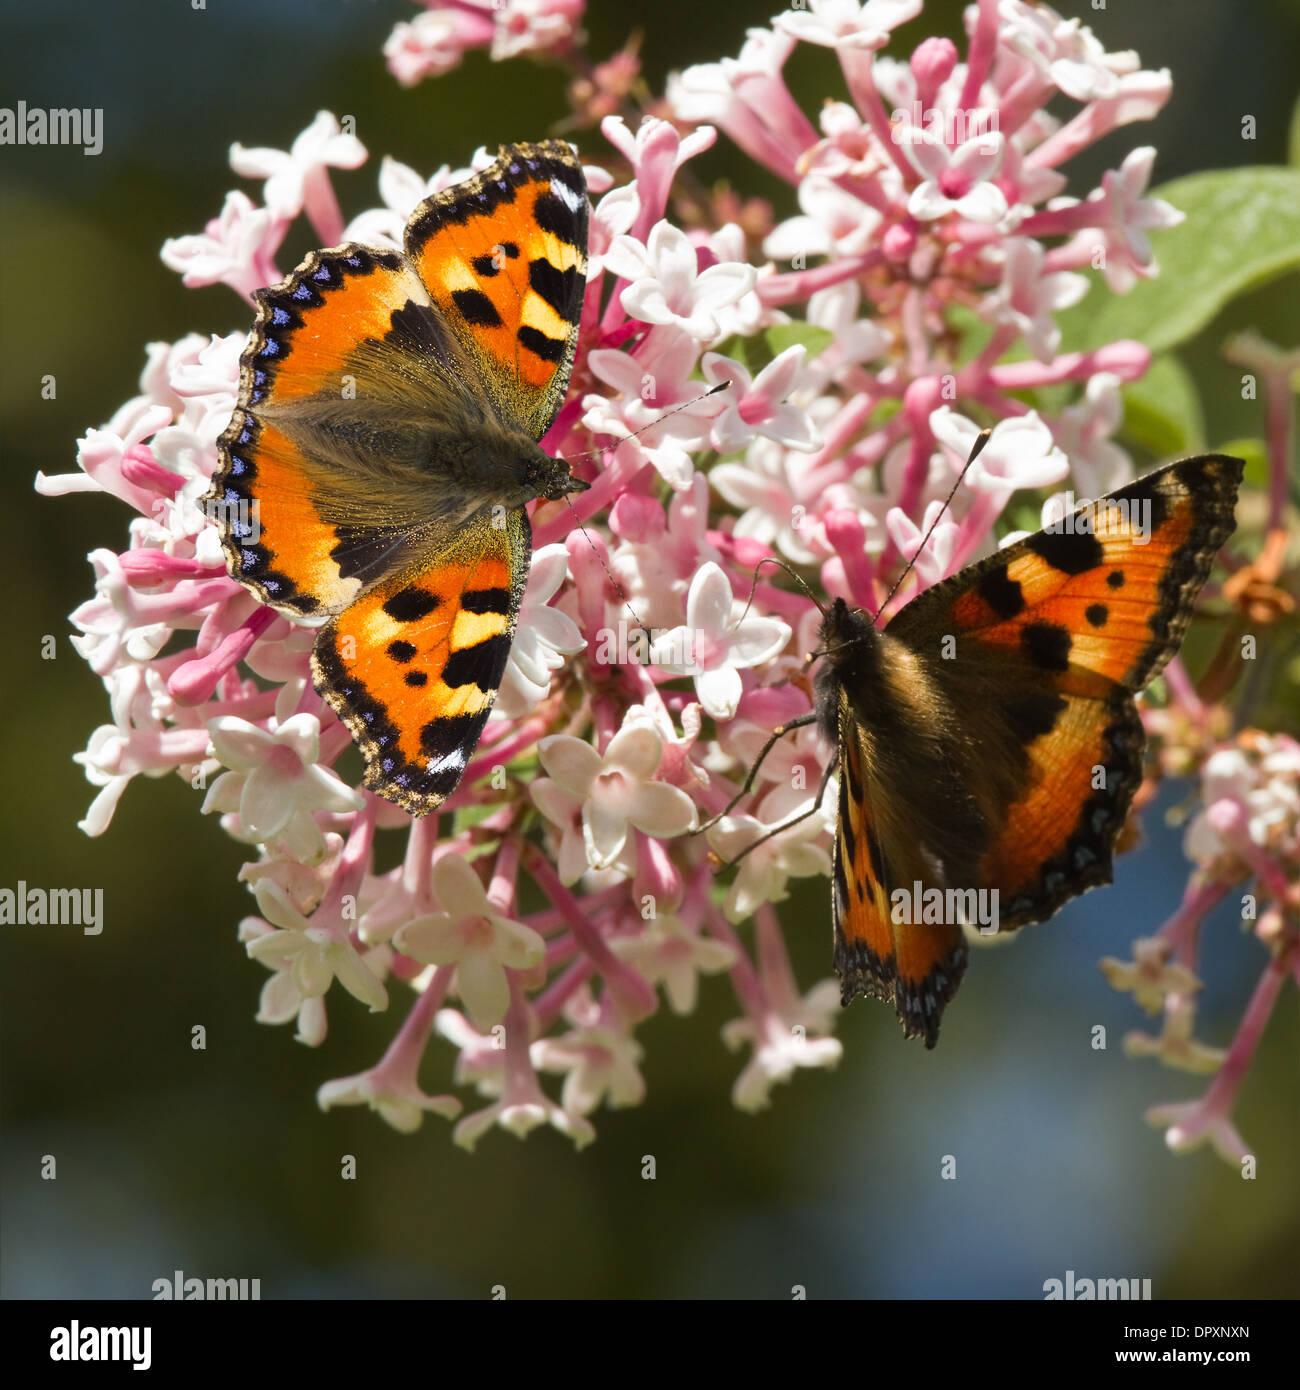 Small tortoiseshell butterflies feeding on Syringa flowers in summer - Stock Image